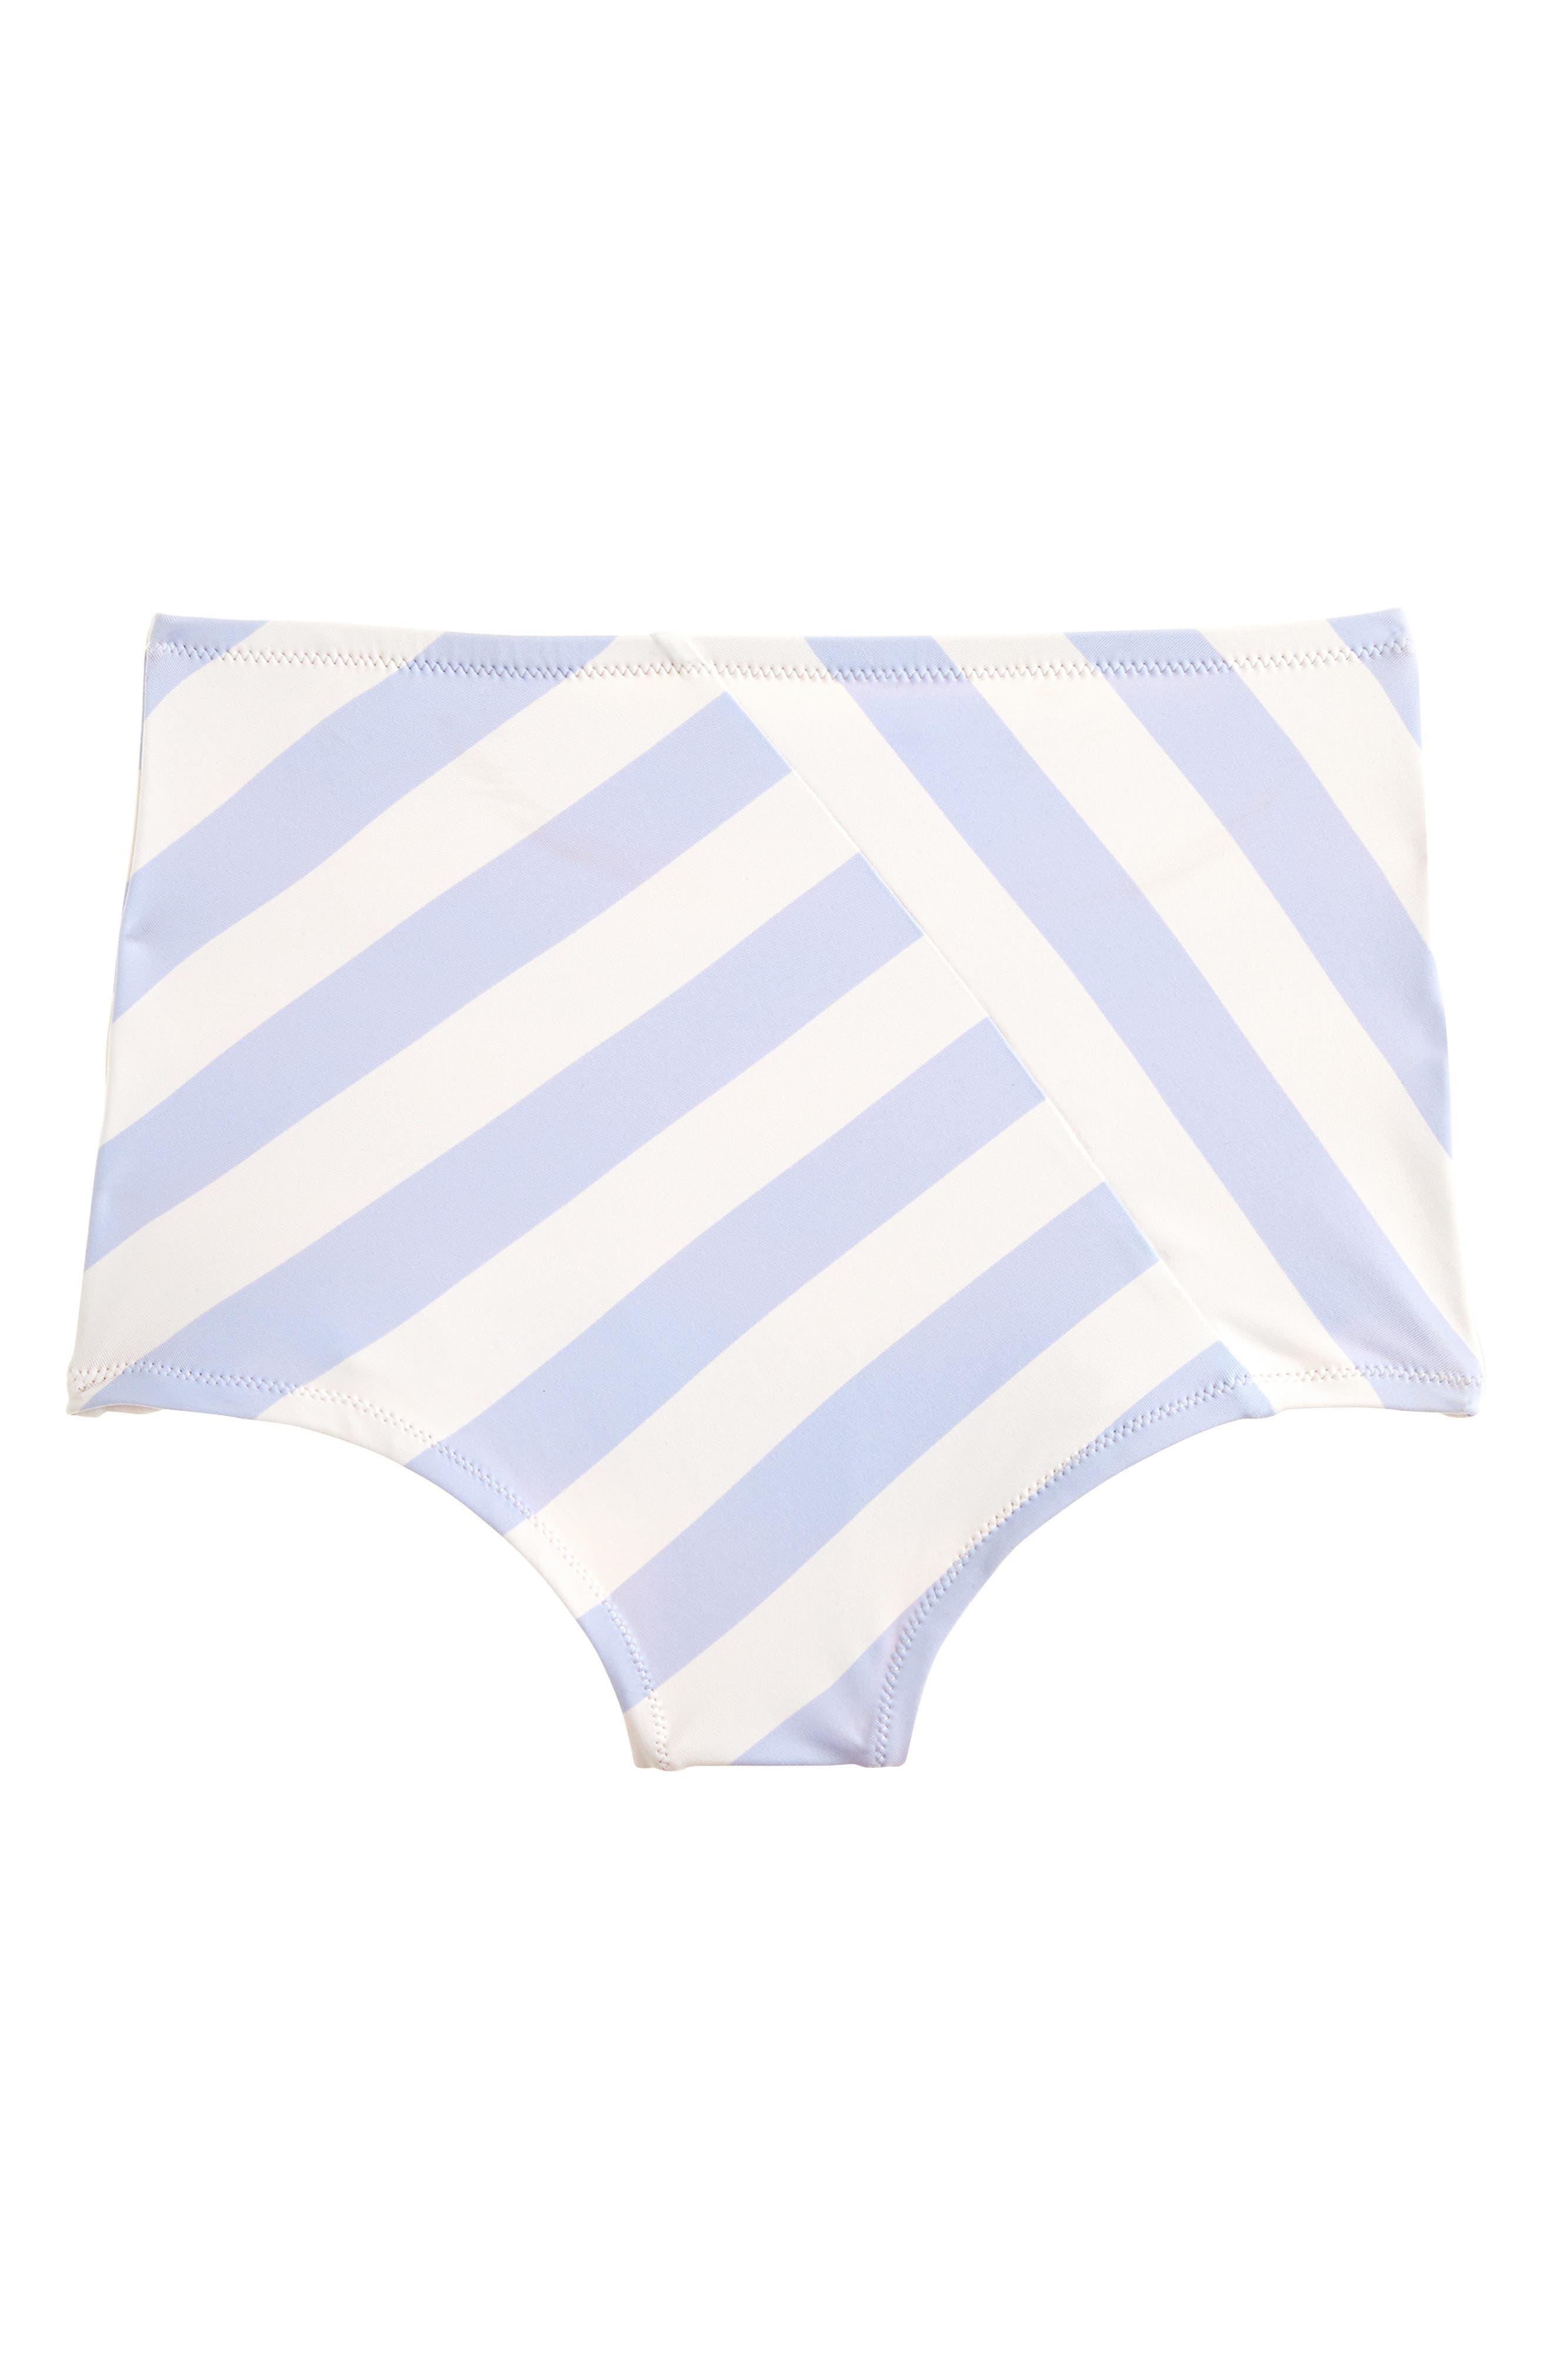 J.CREW, Stripe Seamless High Waist Bikini Bottoms, Alternate thumbnail 3, color, 400